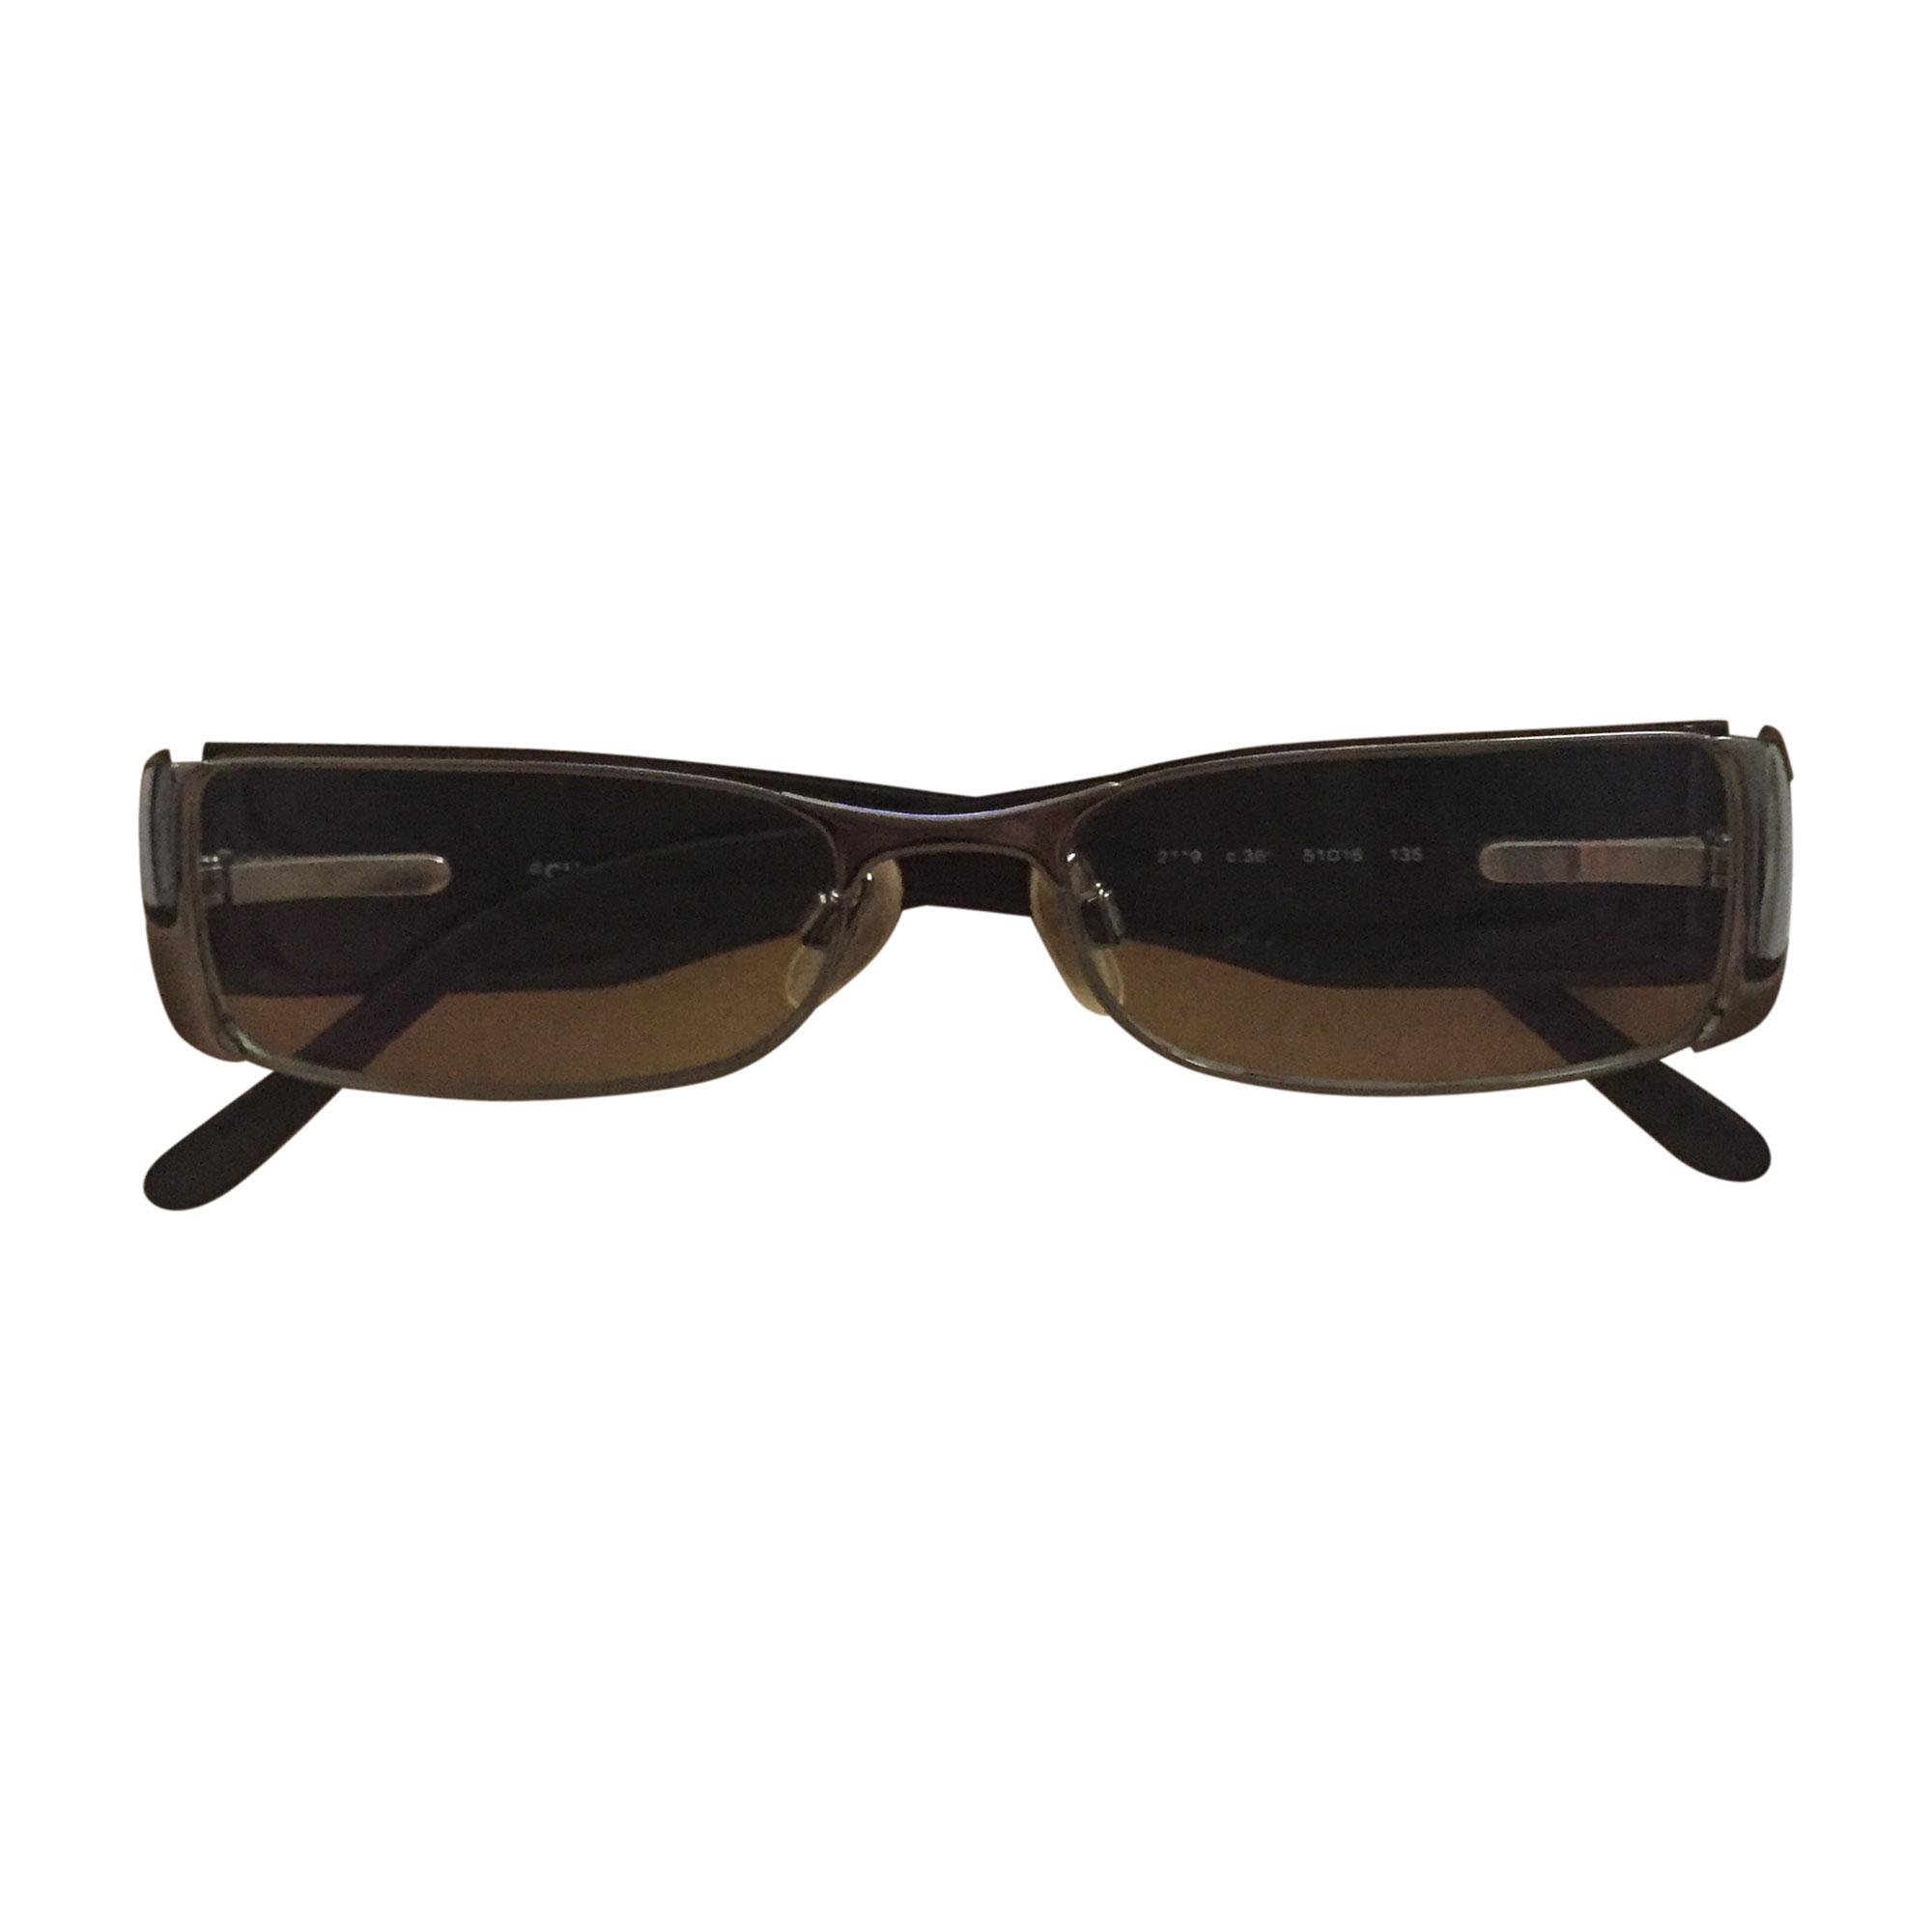 eyeglass frames chanel black 4923298